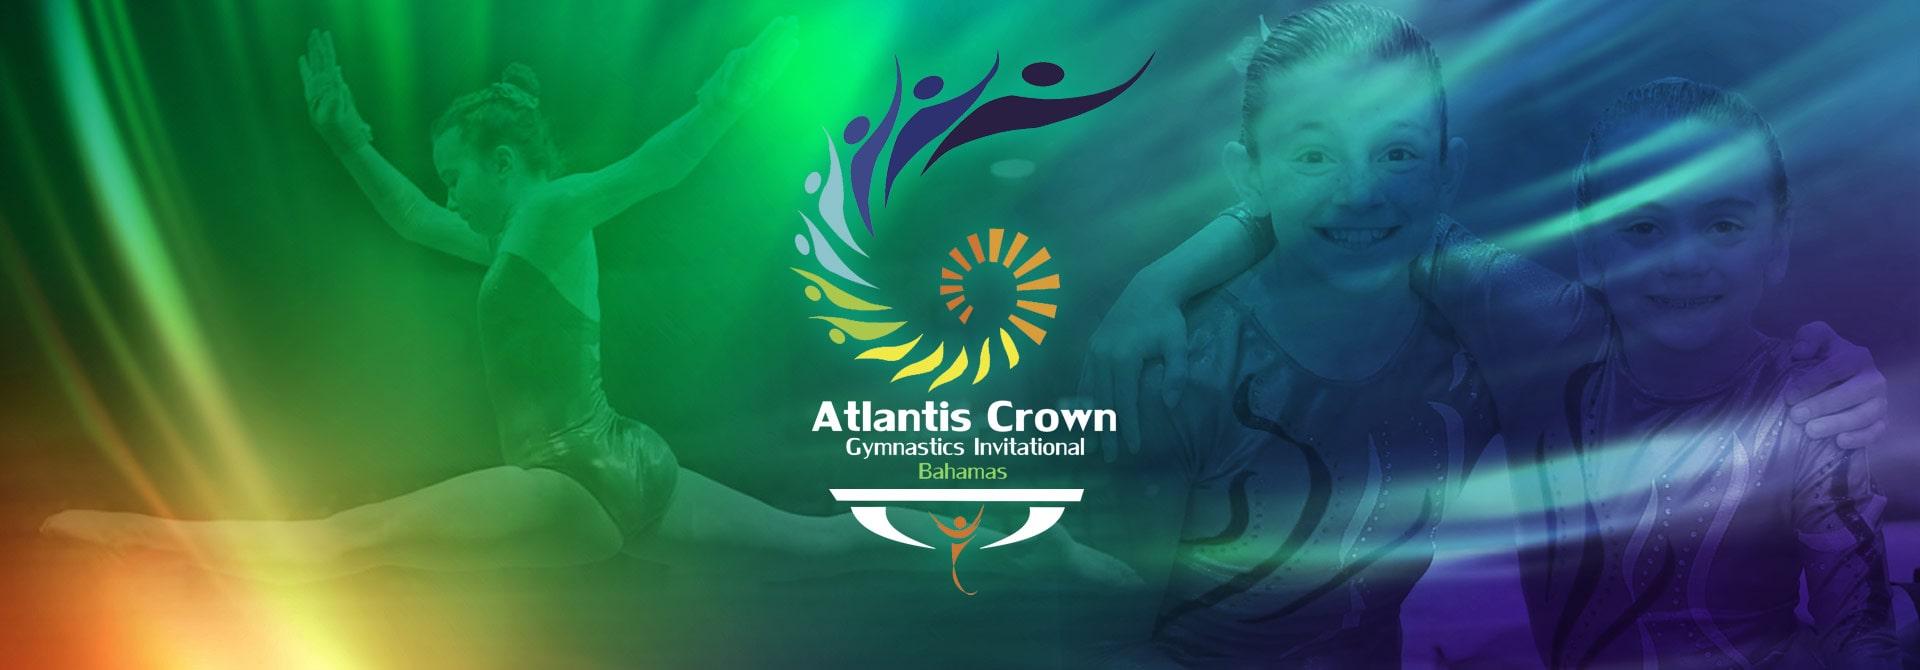 Atlantis Crown Gymnastics Invitational